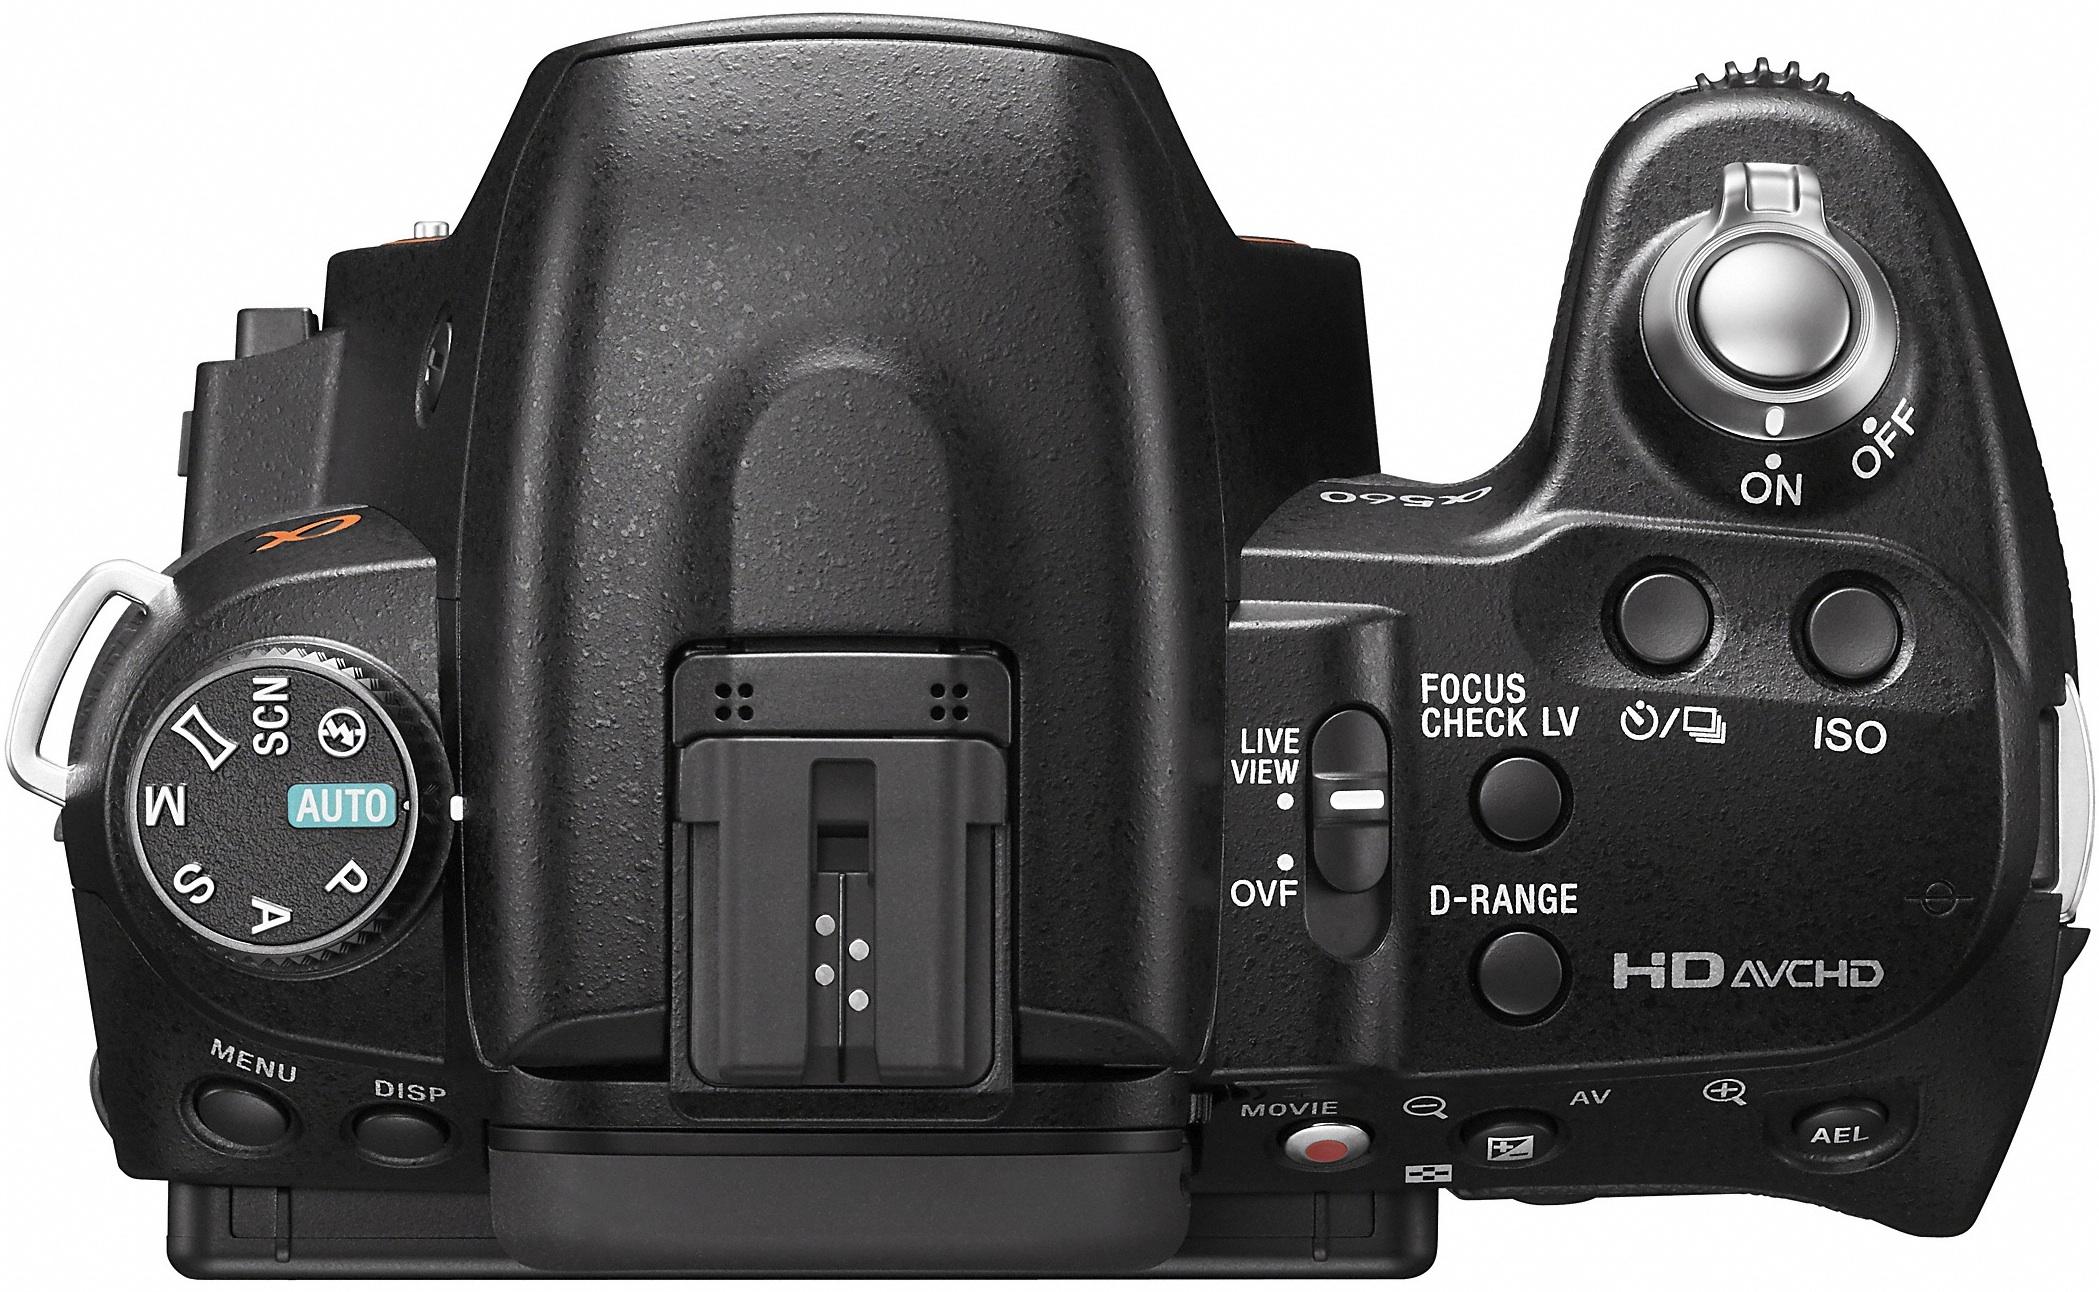 Sony DSLR-A560 Alpha Digital Camera - Top